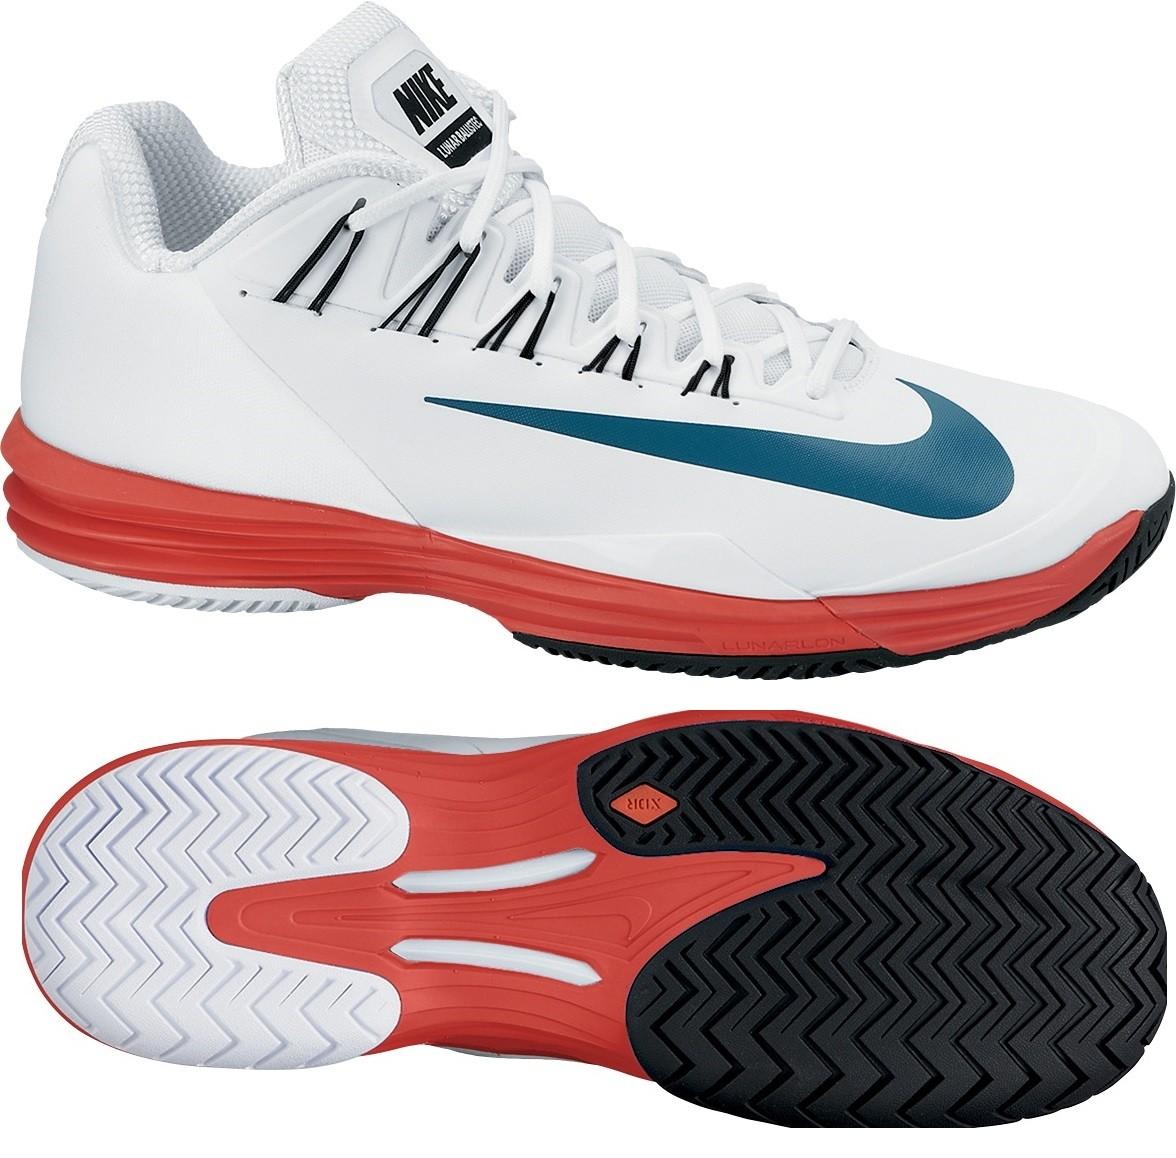 tenisová obuv NIKE LUNAR BALLISTEC bílá 631653-136 2e4b437197